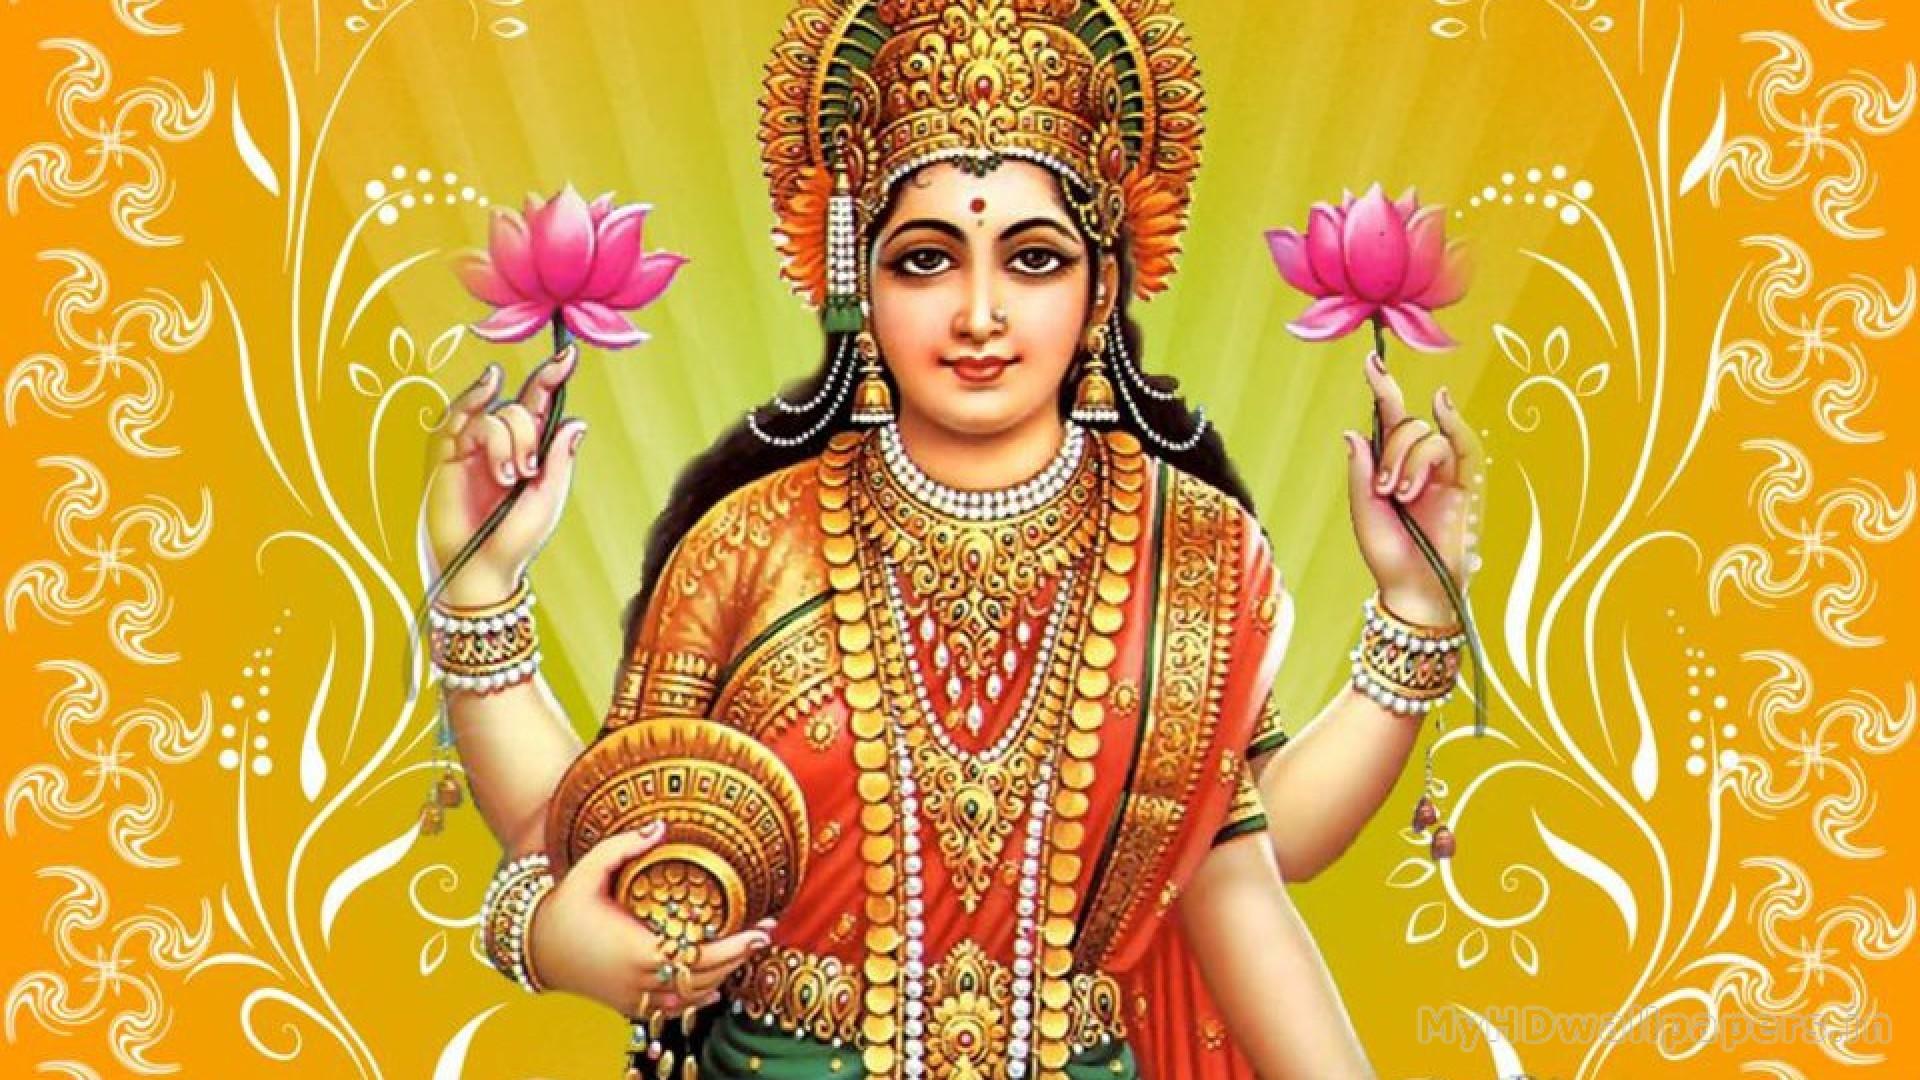 1920x1080 hindu god hd wallpapers android apps on google play 1920aƒ 1080 god hd wallpaper